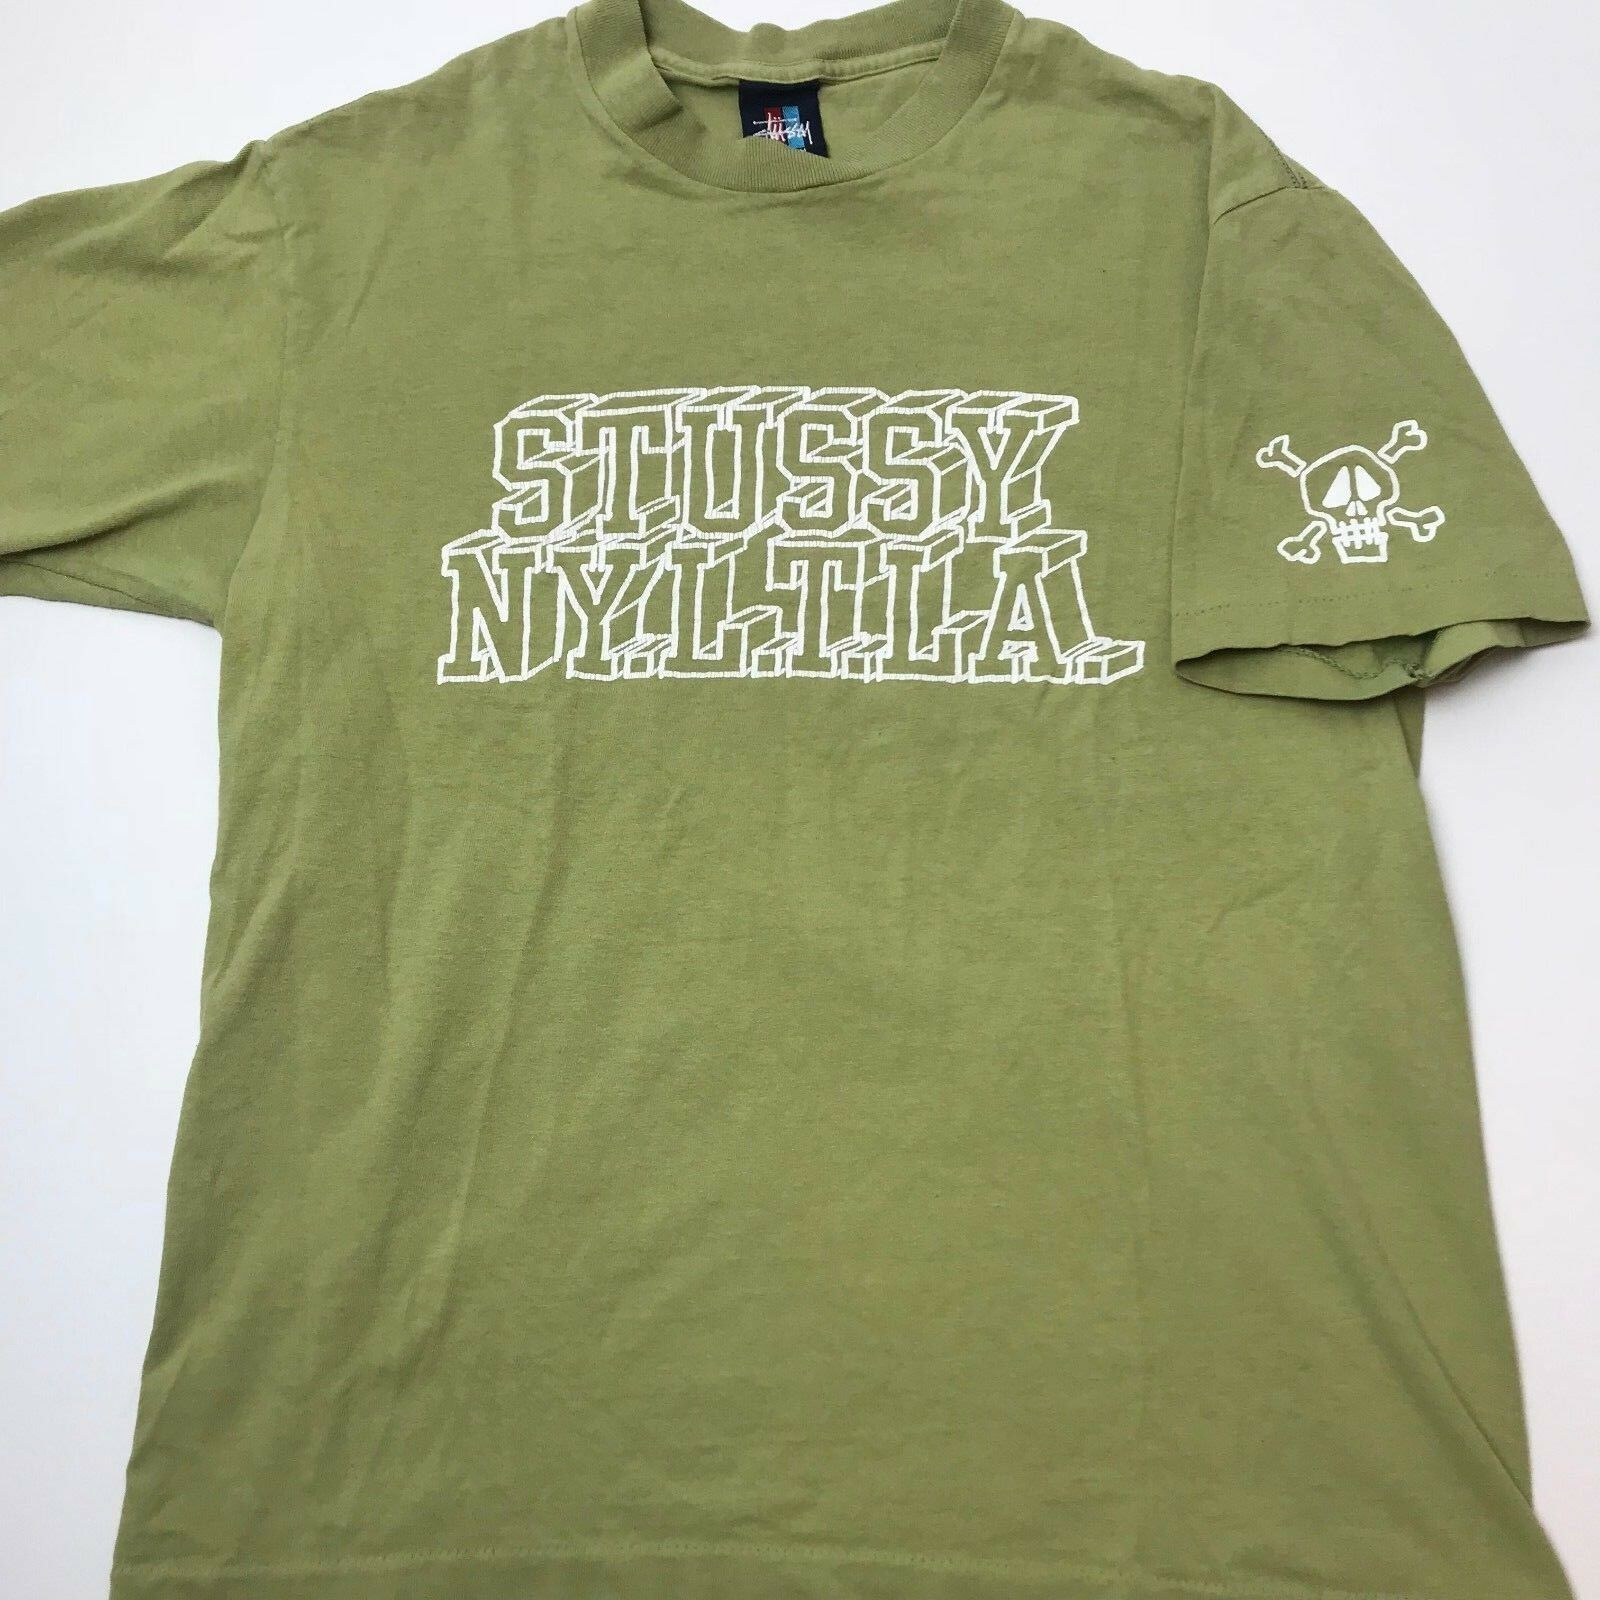 Vintage 90s Made In USA Stussy Shirt Medium Single Stitch Streetwear Skateboard